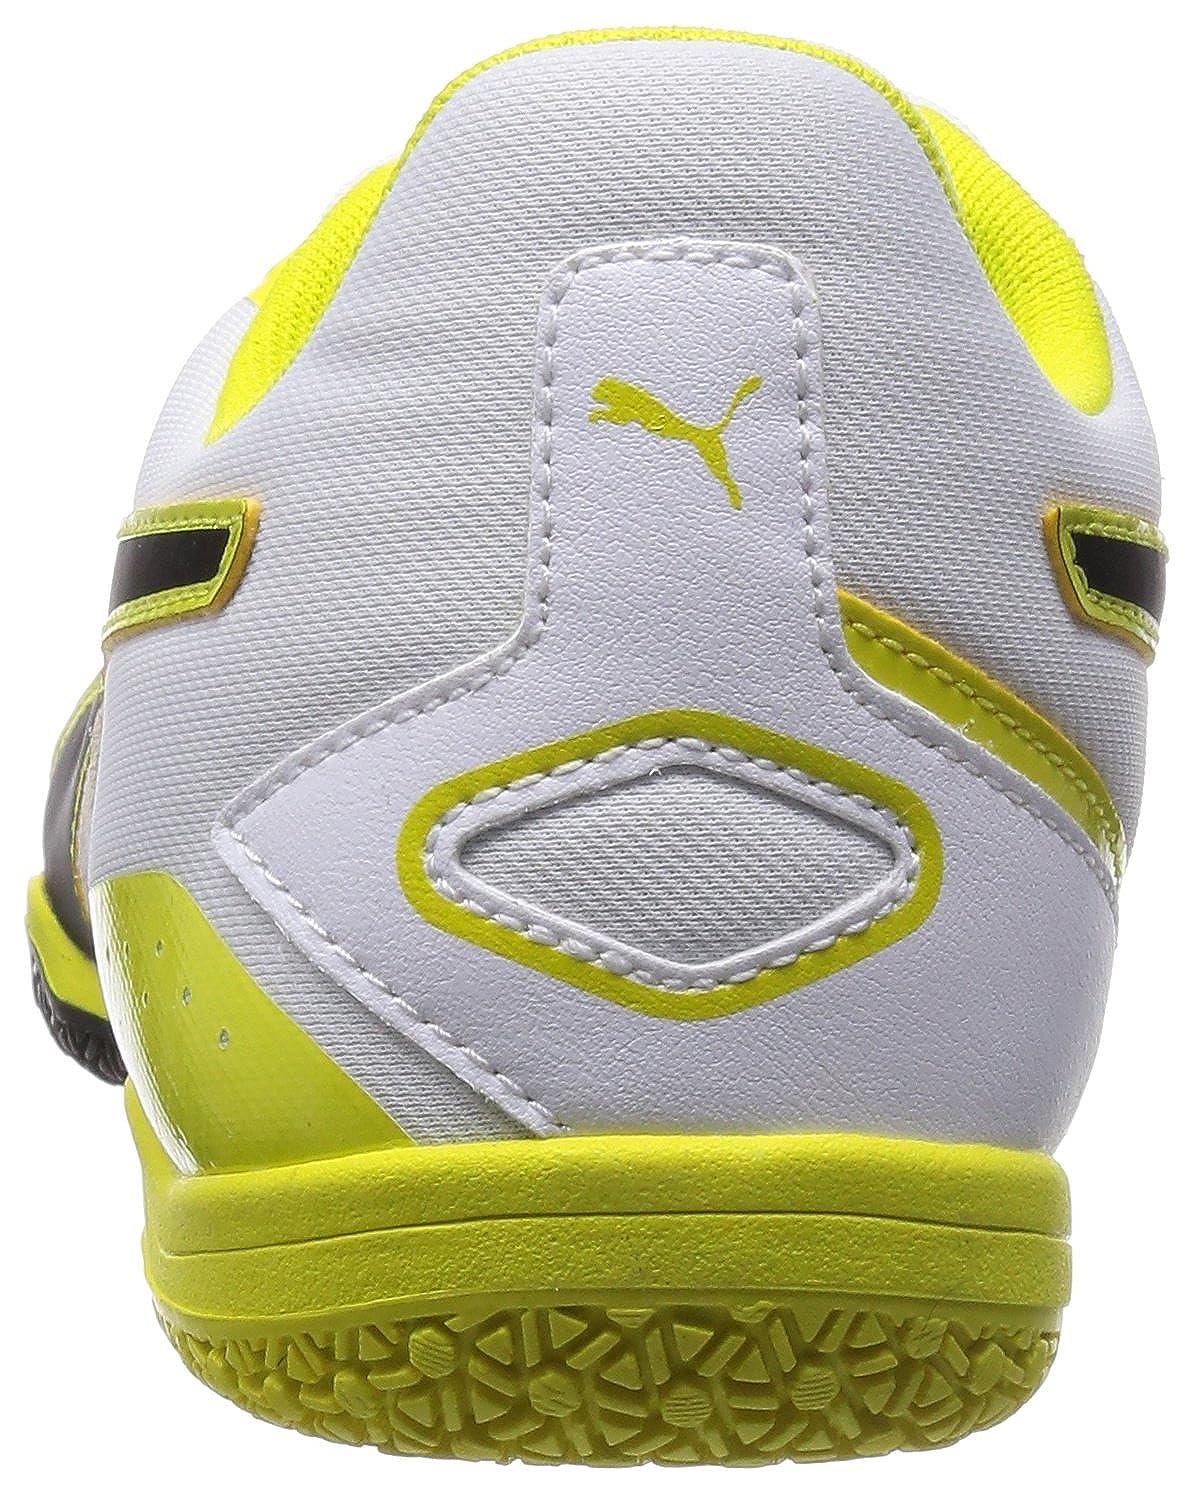 Amazon.com | PUMA Invicto Sala Mens Leather Futsal Soccer Sneakers/Boots | Soccer